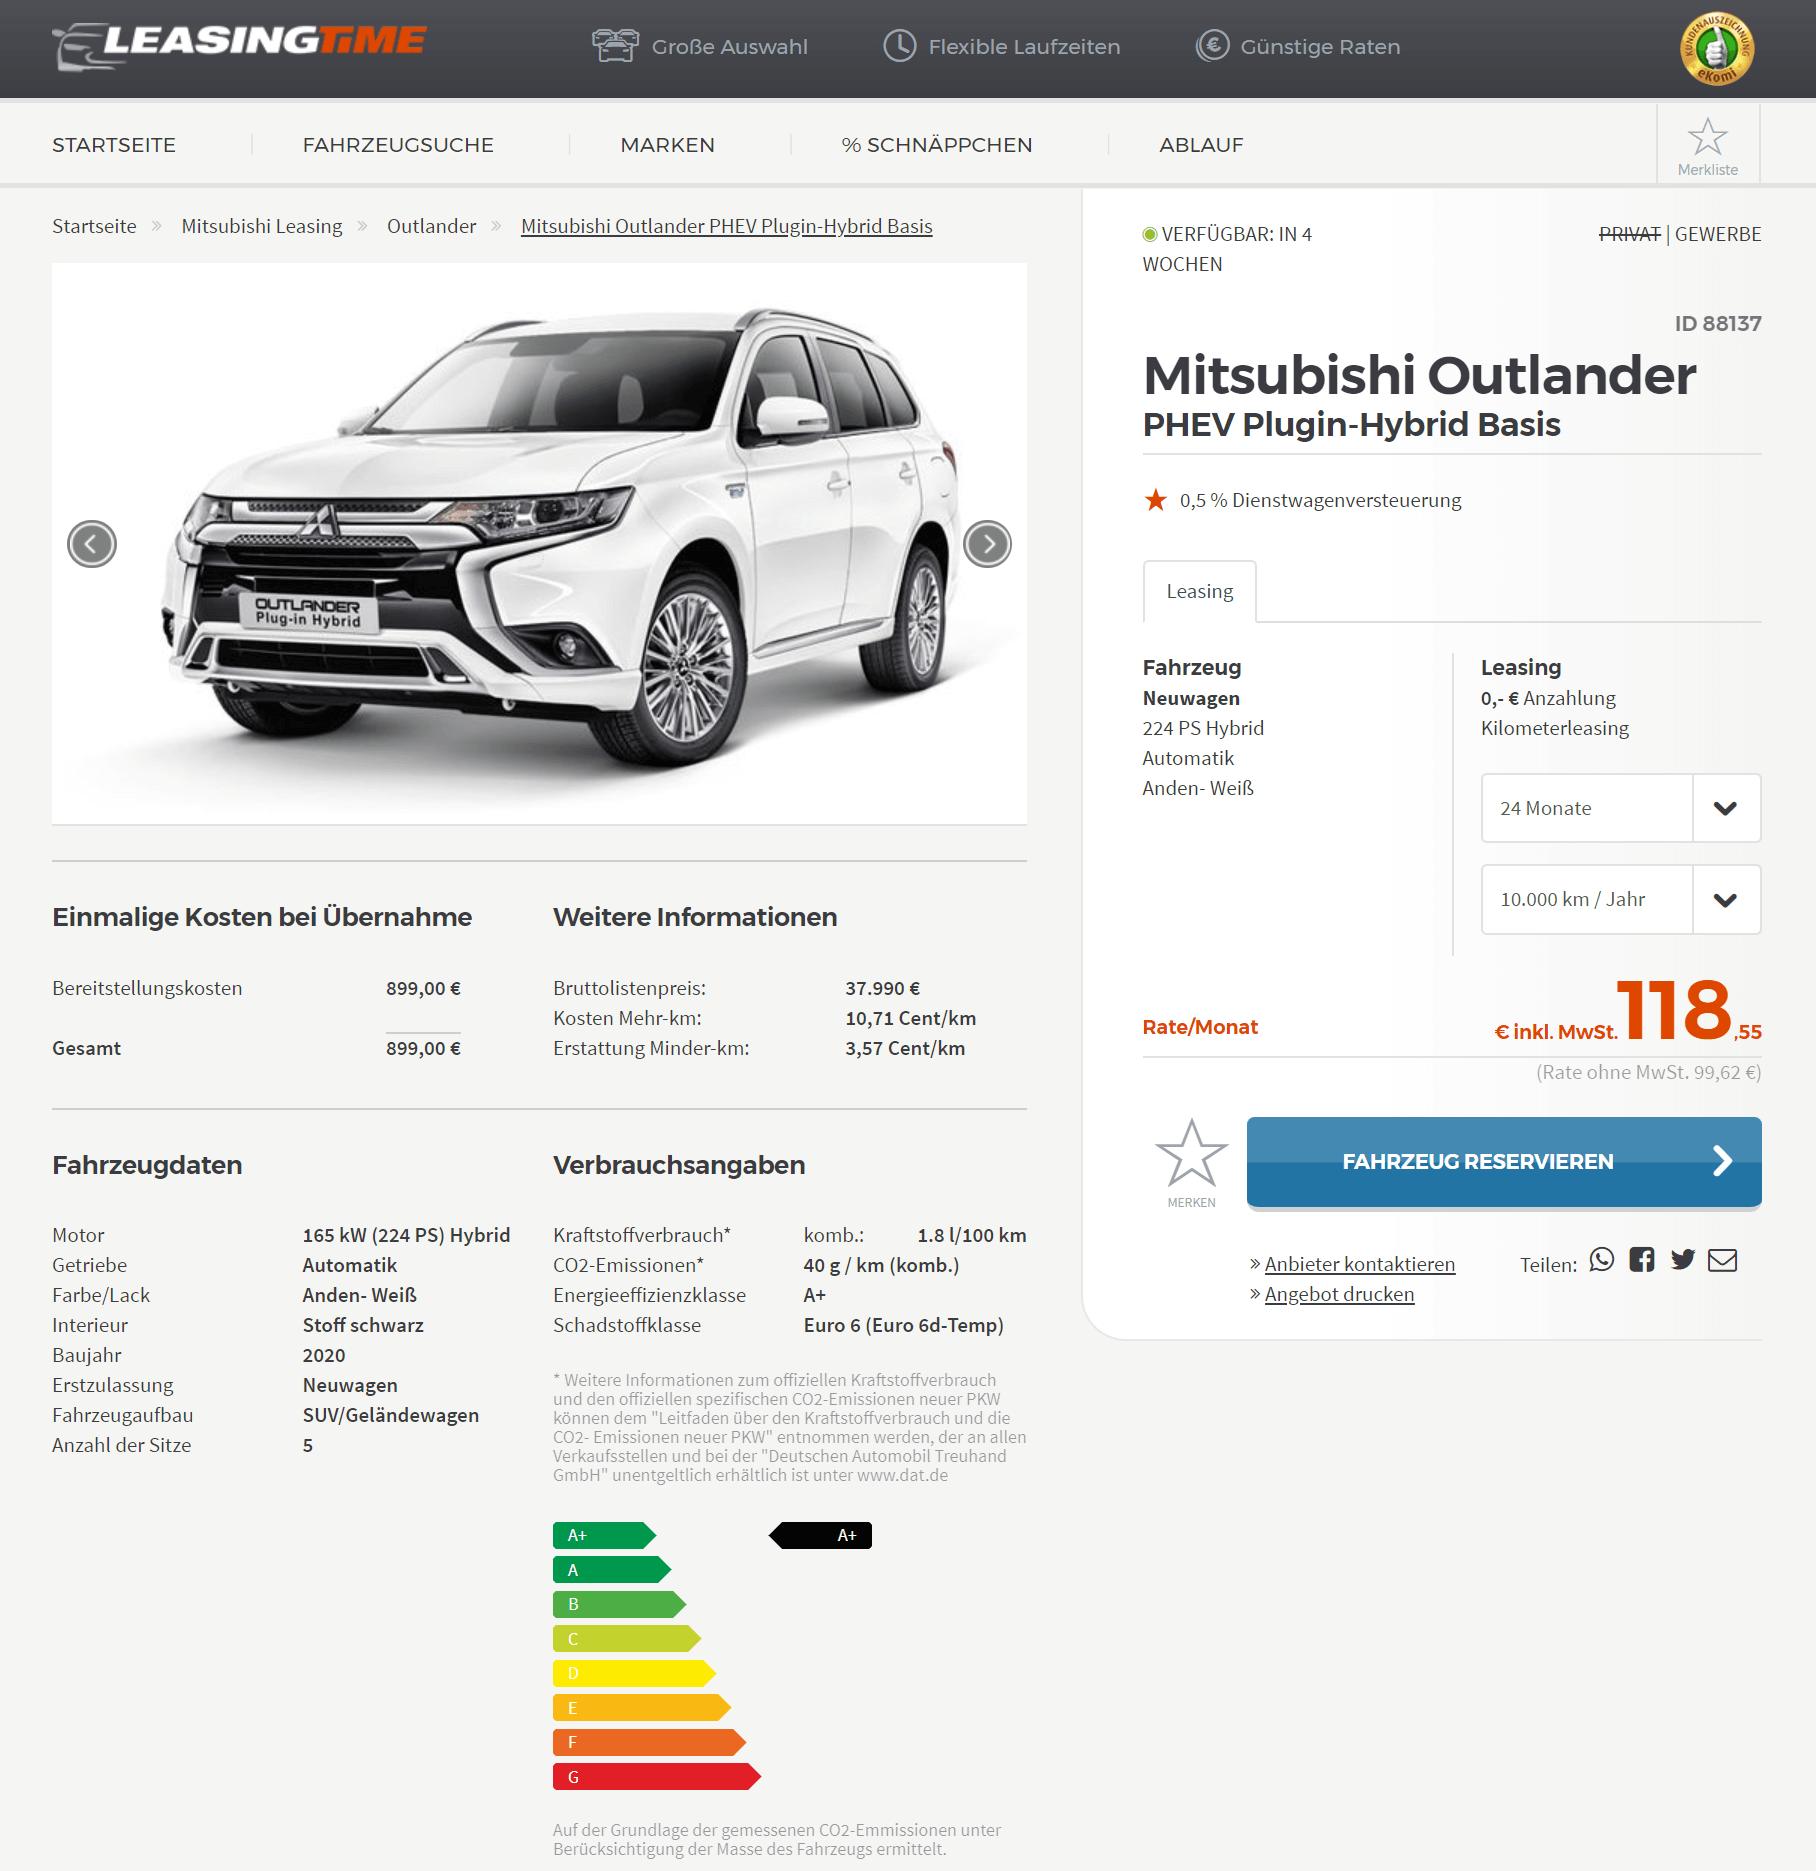 Hot Mitsubishi Outlander Phev Plug In Hybrid Basis Leasing Fur 99 62 177 75 Euro Im Monat Netto Bestellfahrzeug Bafa 0 5 Regelung Sparneuwagen De